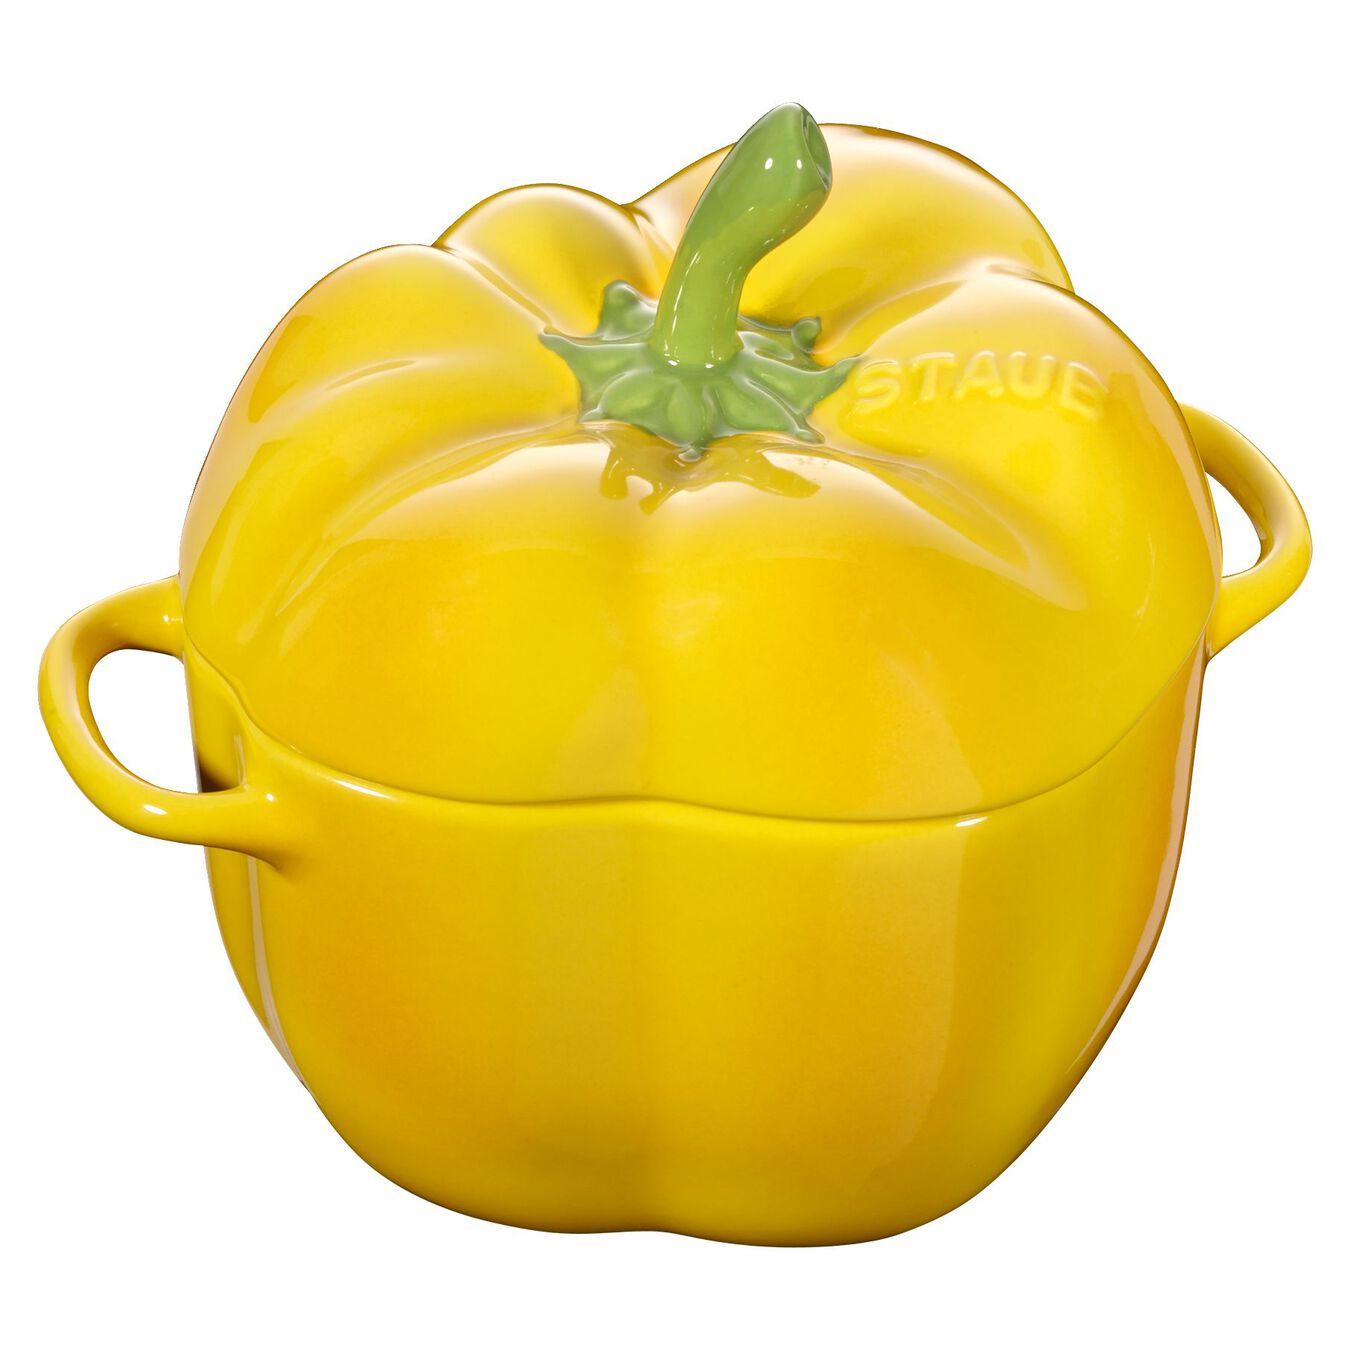 Cocotte 12 cm, Paprika, Gelb, Keramik,,large 1